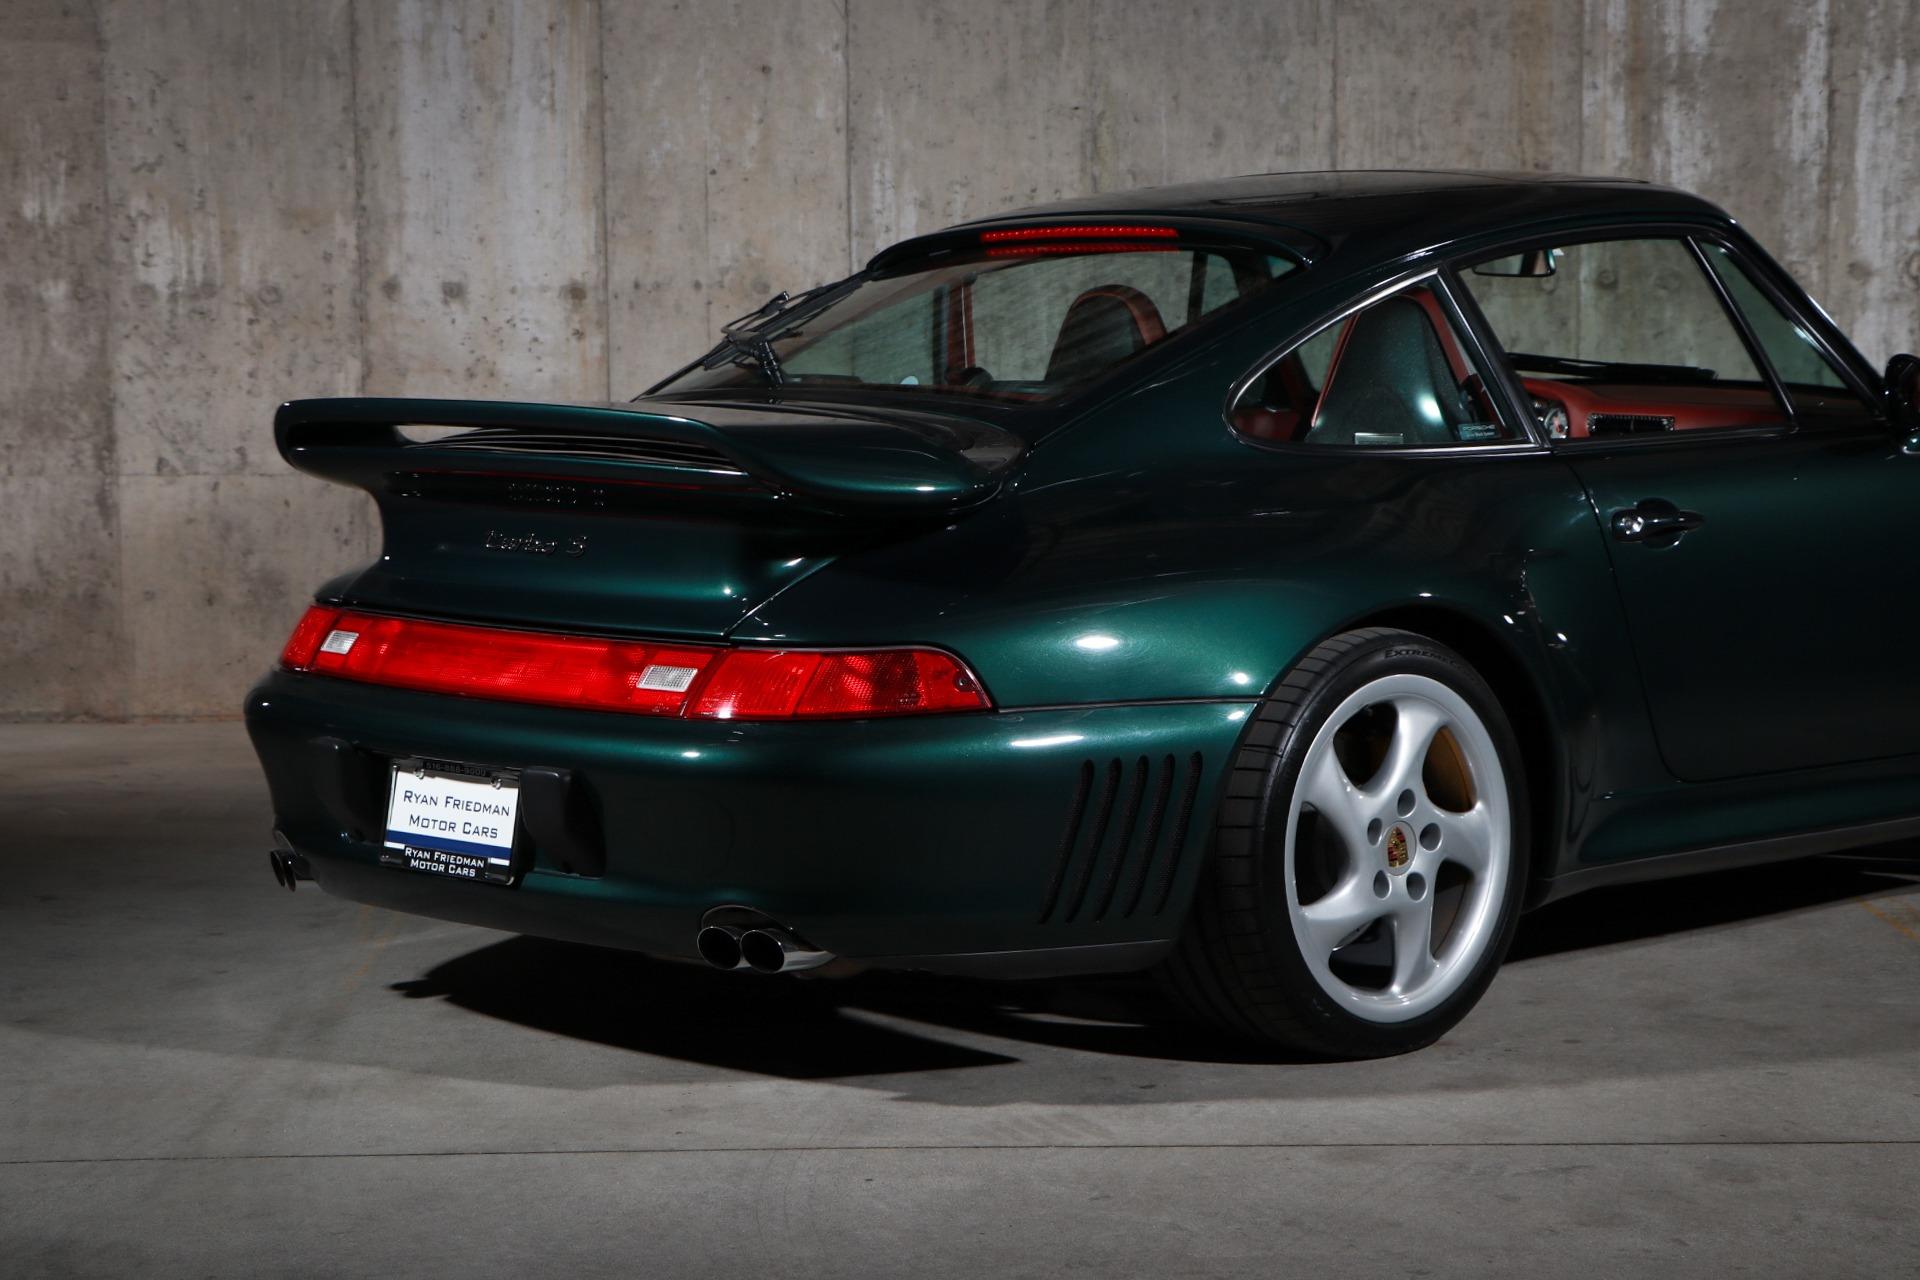 Used 1997 Porsche 911 Turbo   Glen Cove, NY